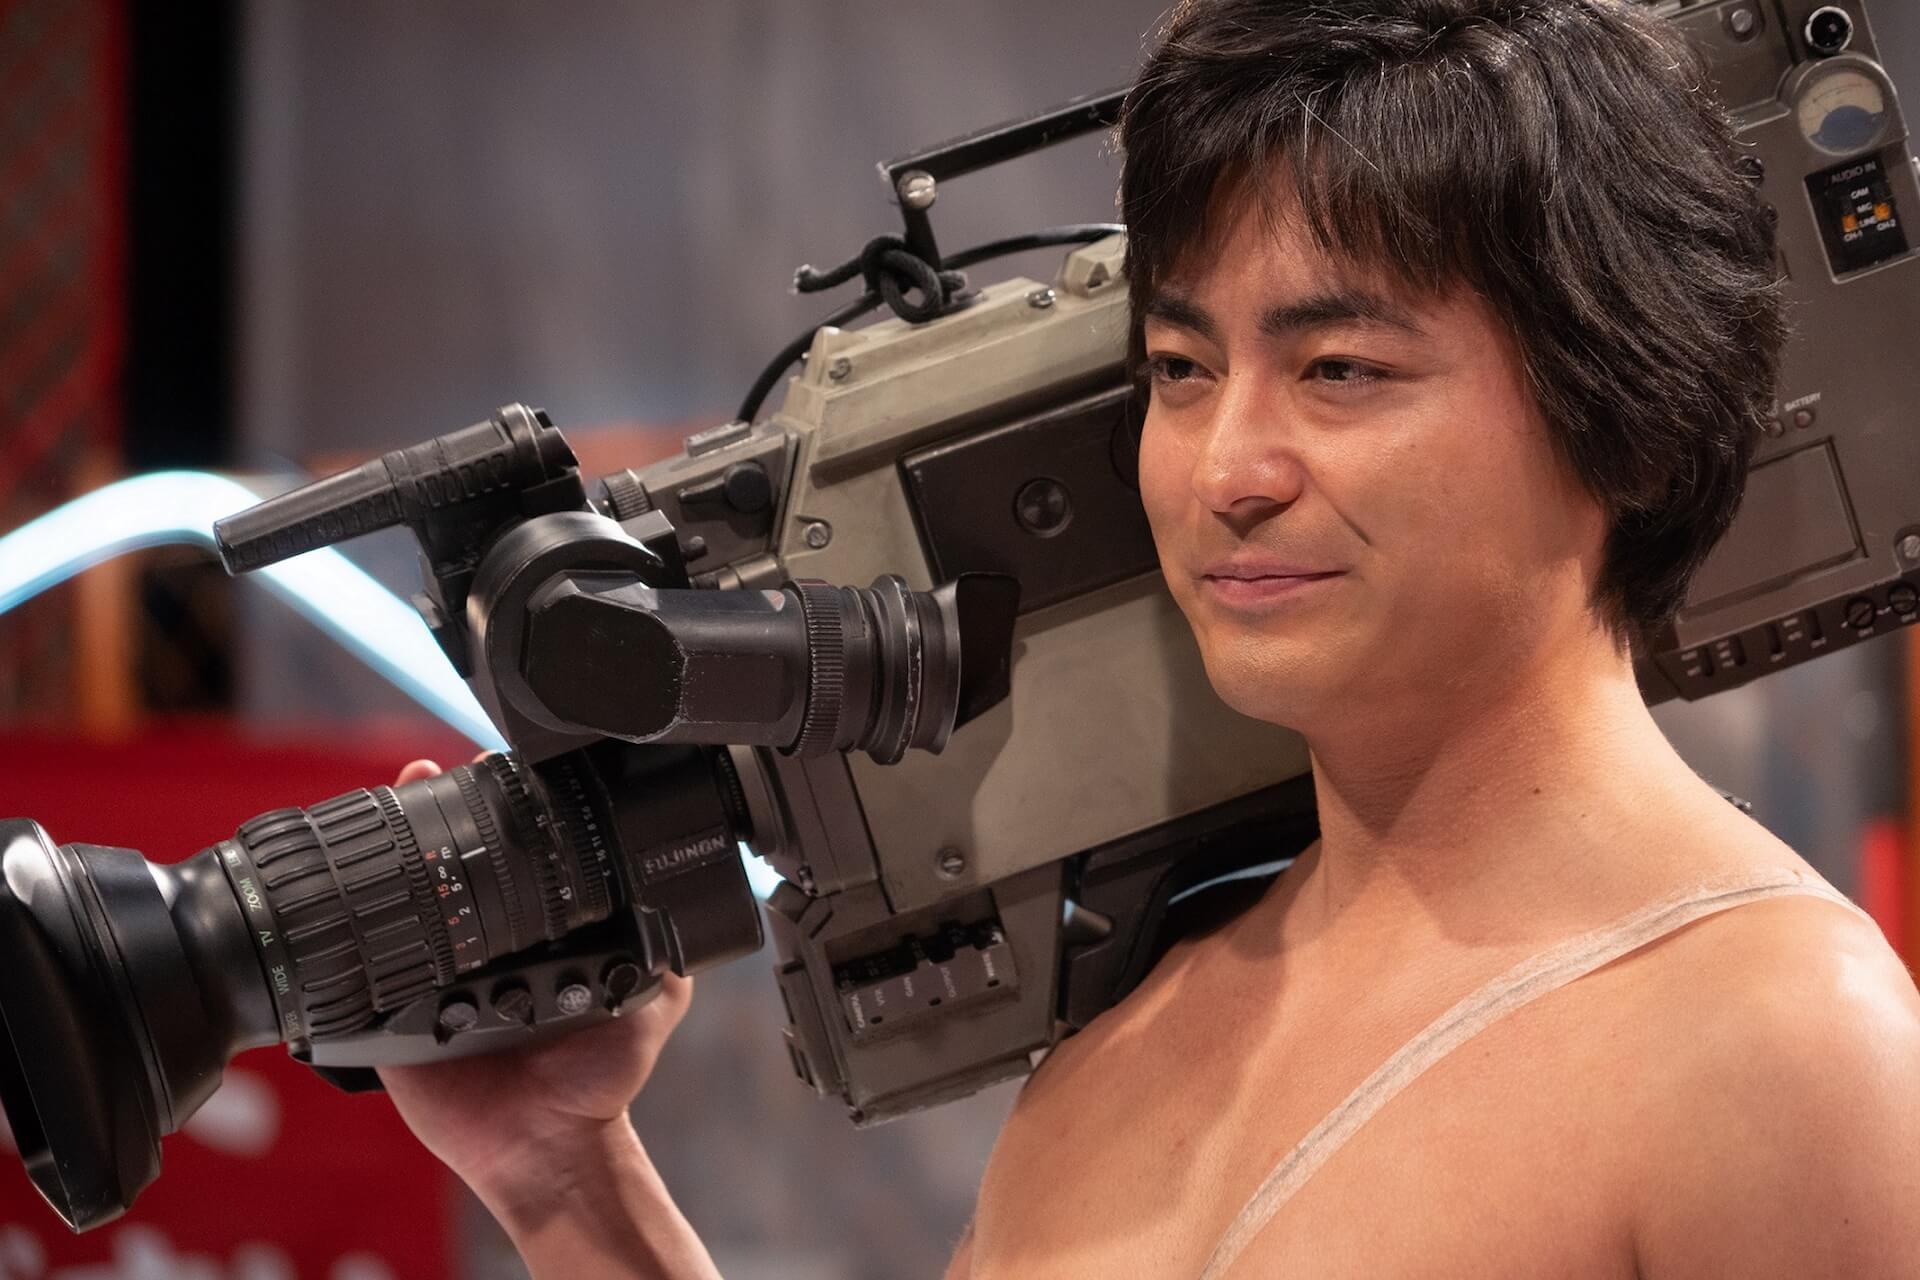 Netflix『全裸監督』のシーズン2が制作決定!ハワイでの貴重なメイキング映像も解禁に film190816-zenrakantoku-2